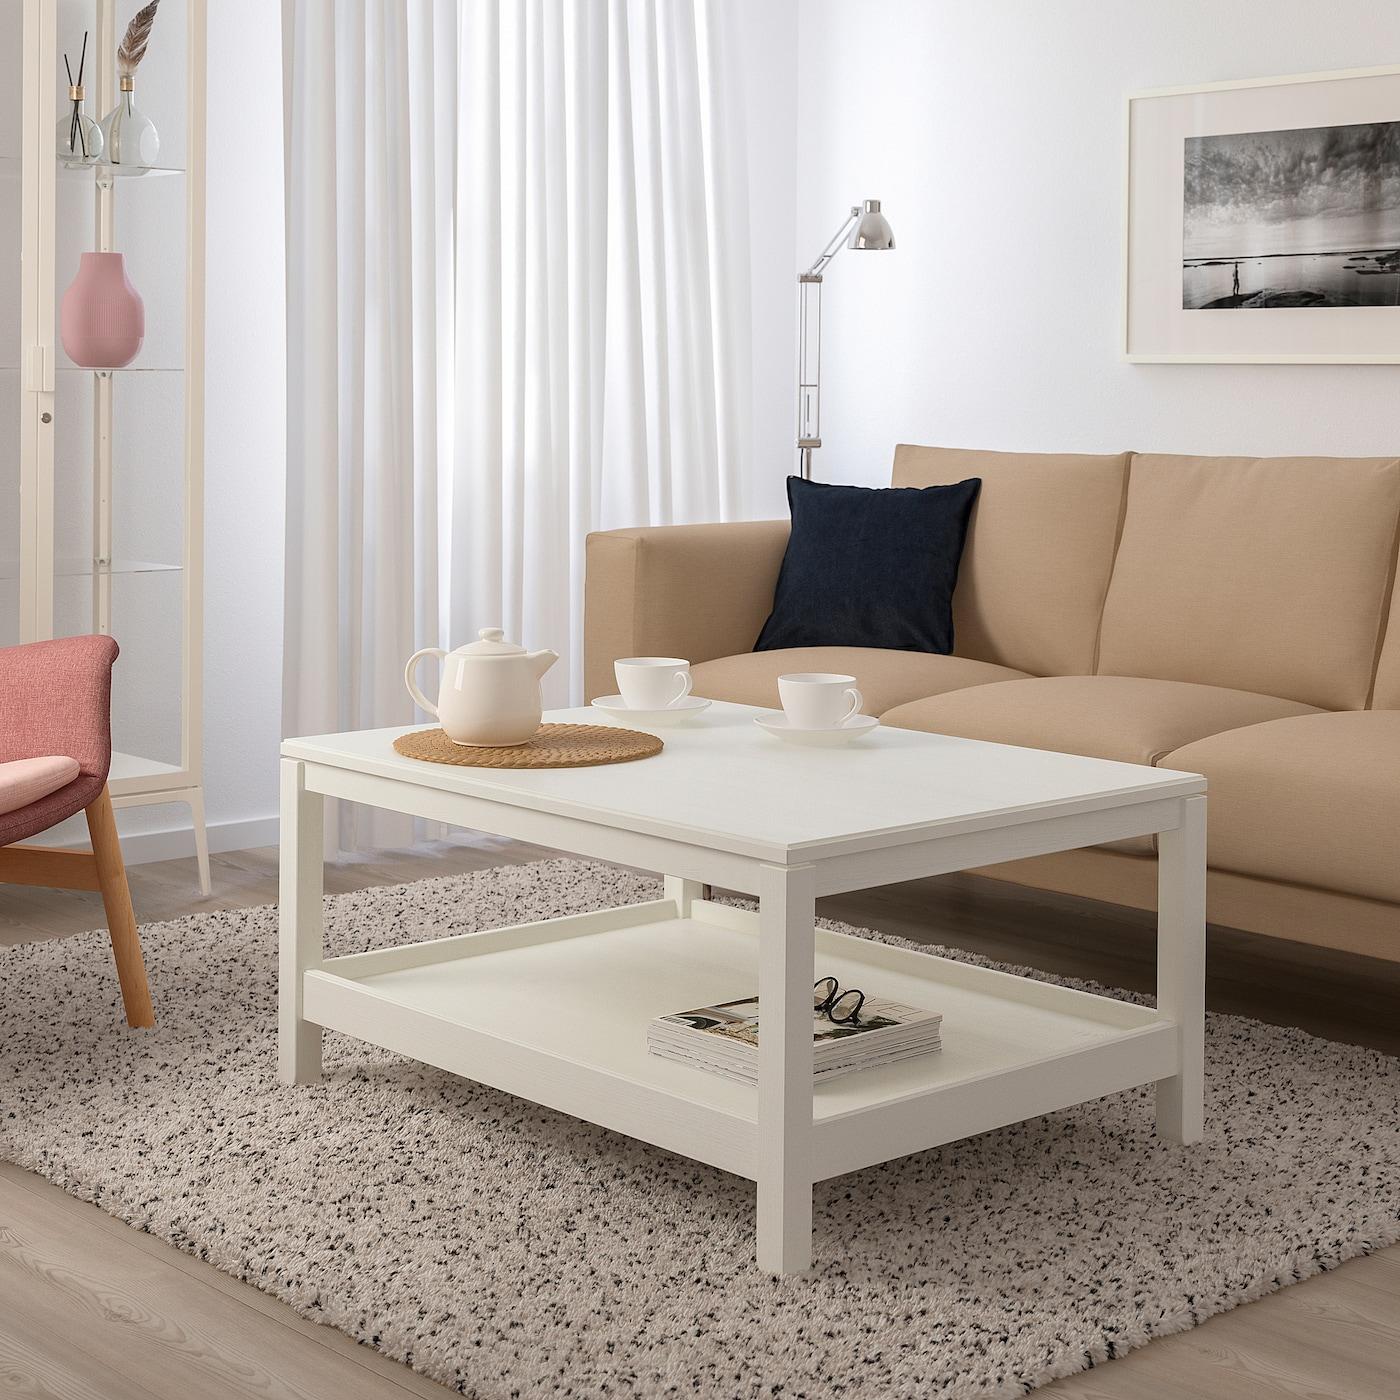 Havsta Coffee Table White 100x75 Cm Ikea Ireland [ 1400 x 1400 Pixel ]